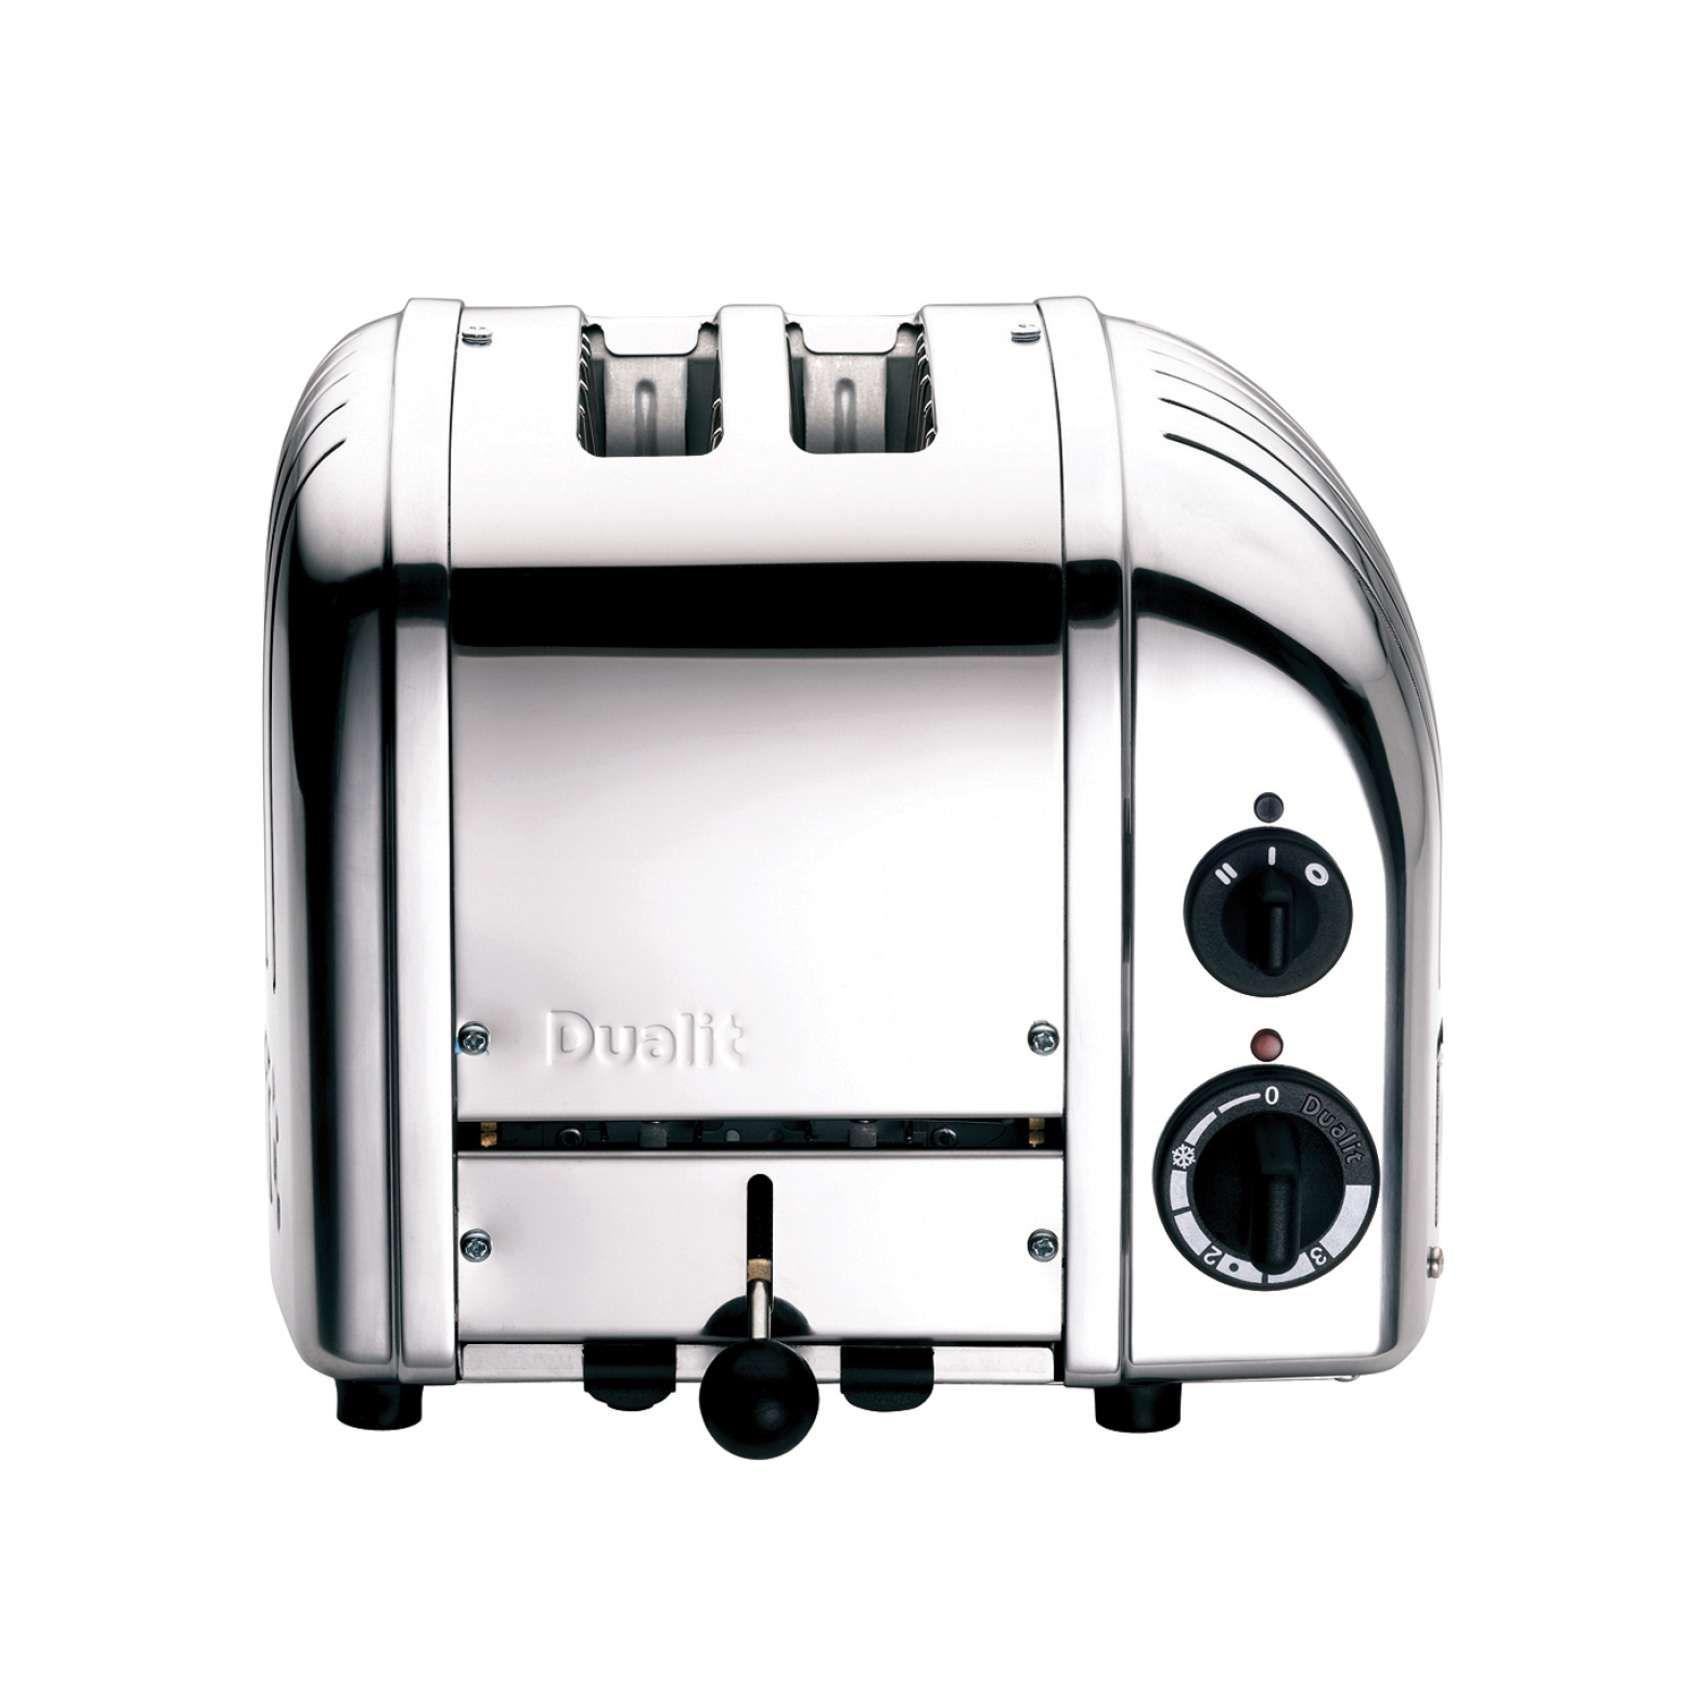 model ip silex toaster com walmart slice industrial proctor